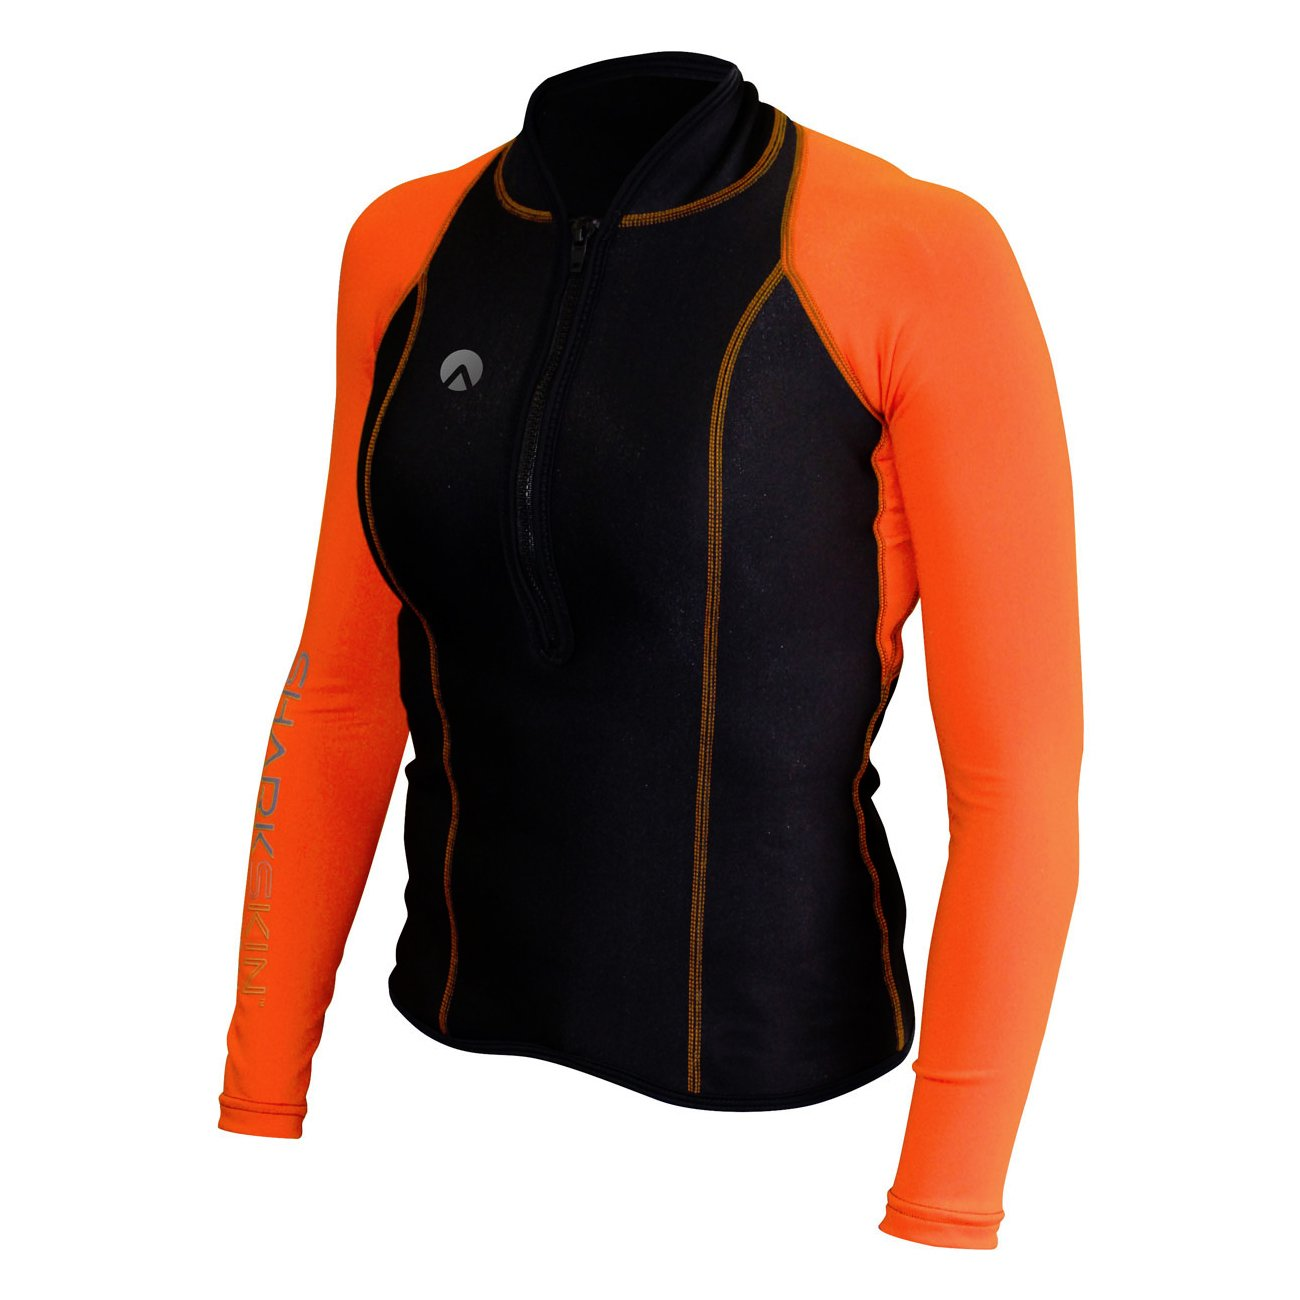 Sharkskin Women's Chillproof Performance Wear Longsleeve Shirt Rash Guard Scuba Water Sports Diving Snorkeling (Orange, 0)